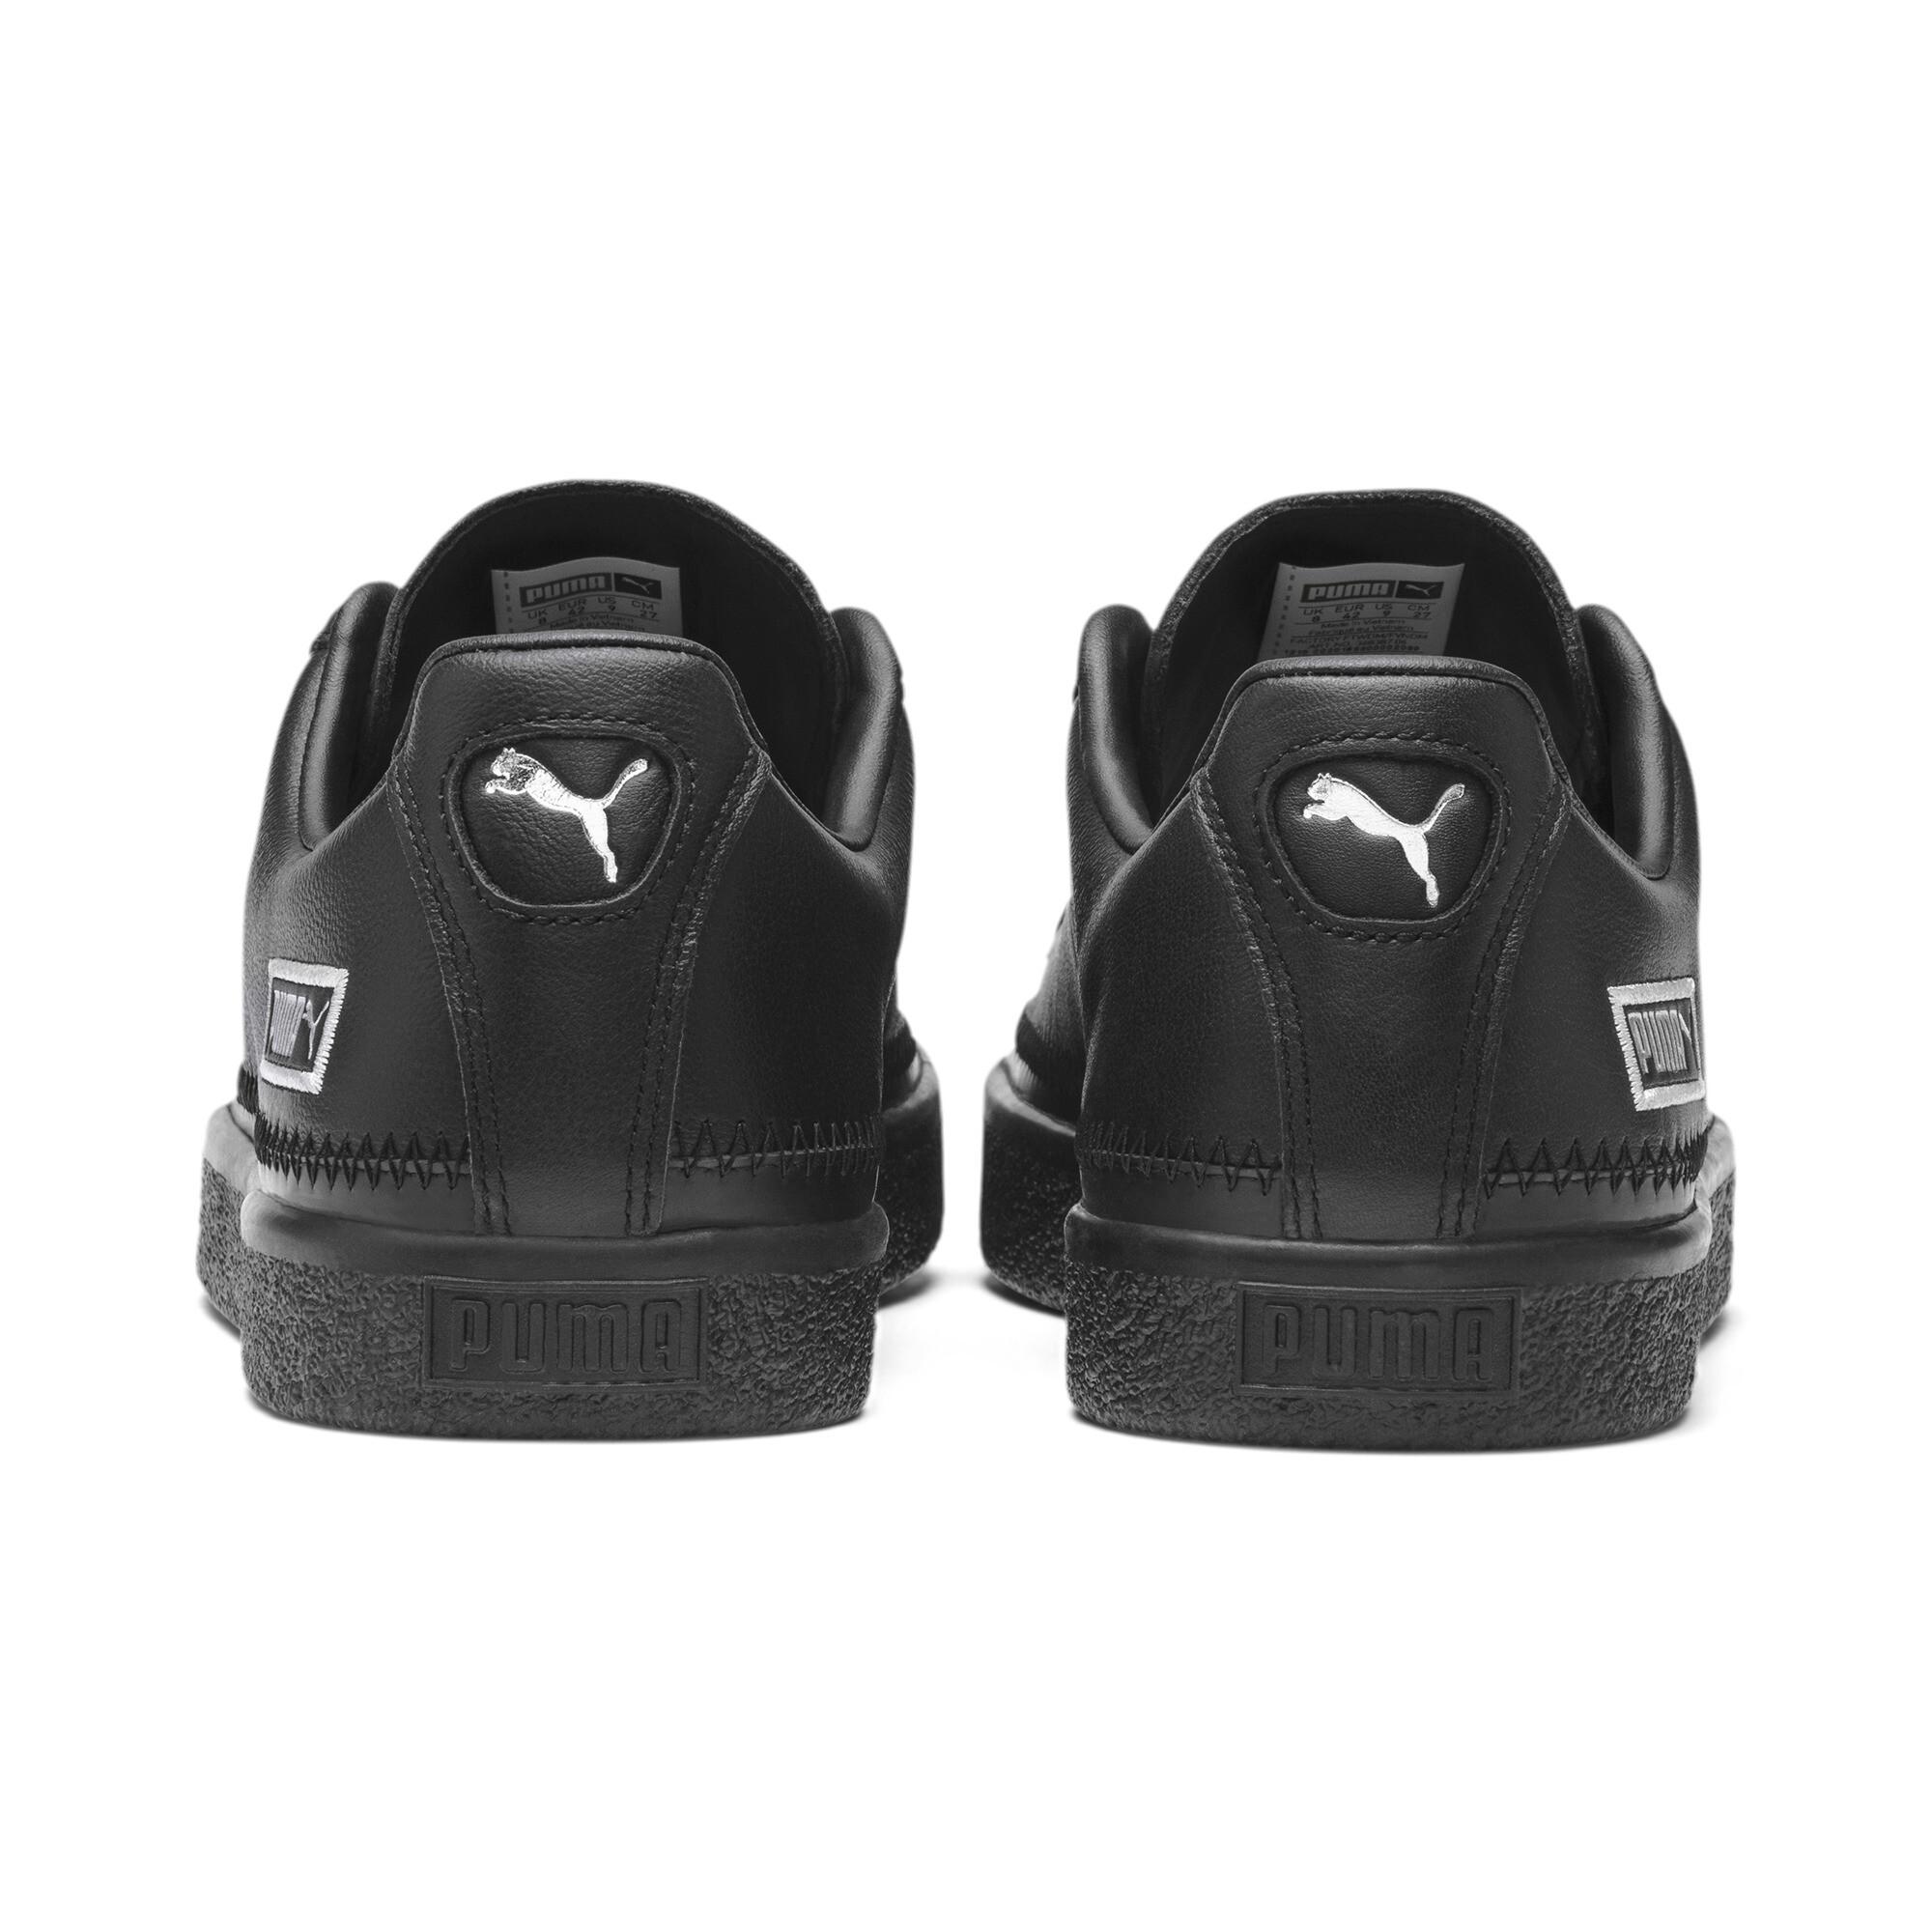 Indexbild 9 - PUMA Basket Stitch Sneaker Unisex Schuhe Neu